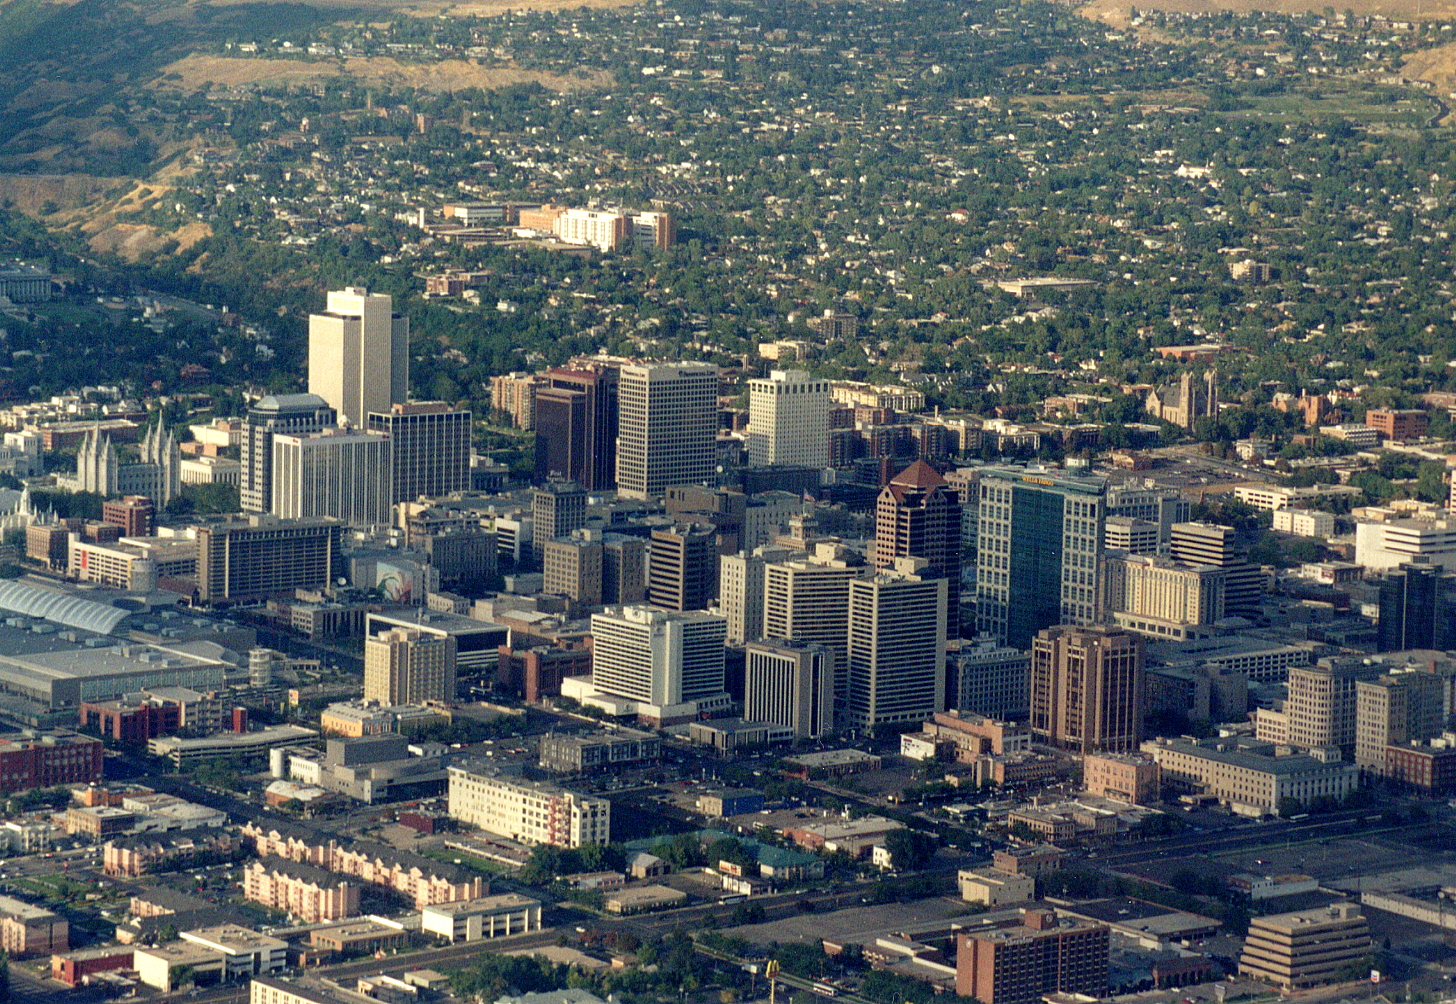 Salt_Lake_City_panorama.jpg